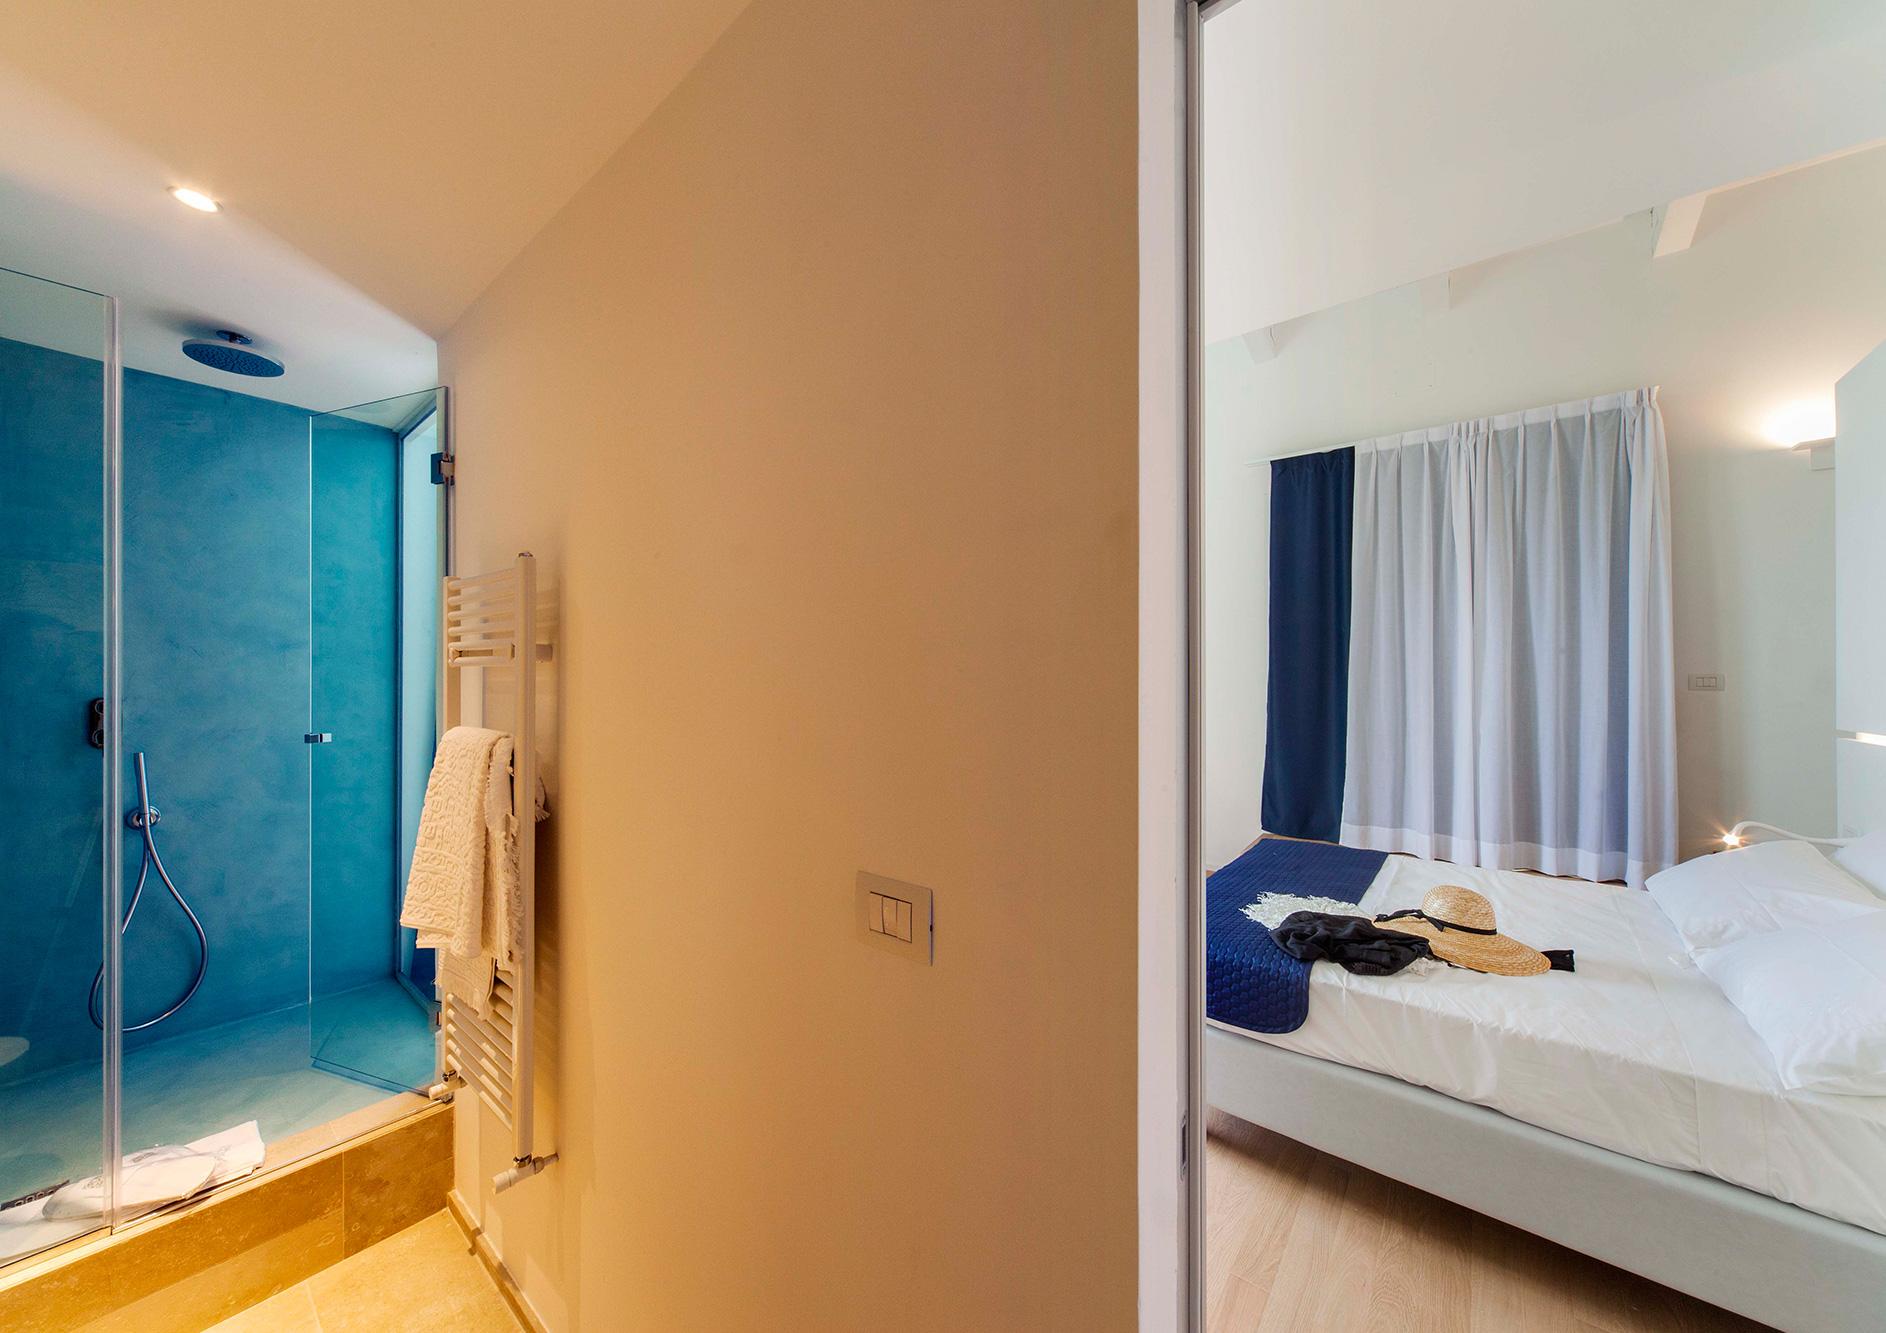 junior-suite-con-terrazzo-vista-mare-16